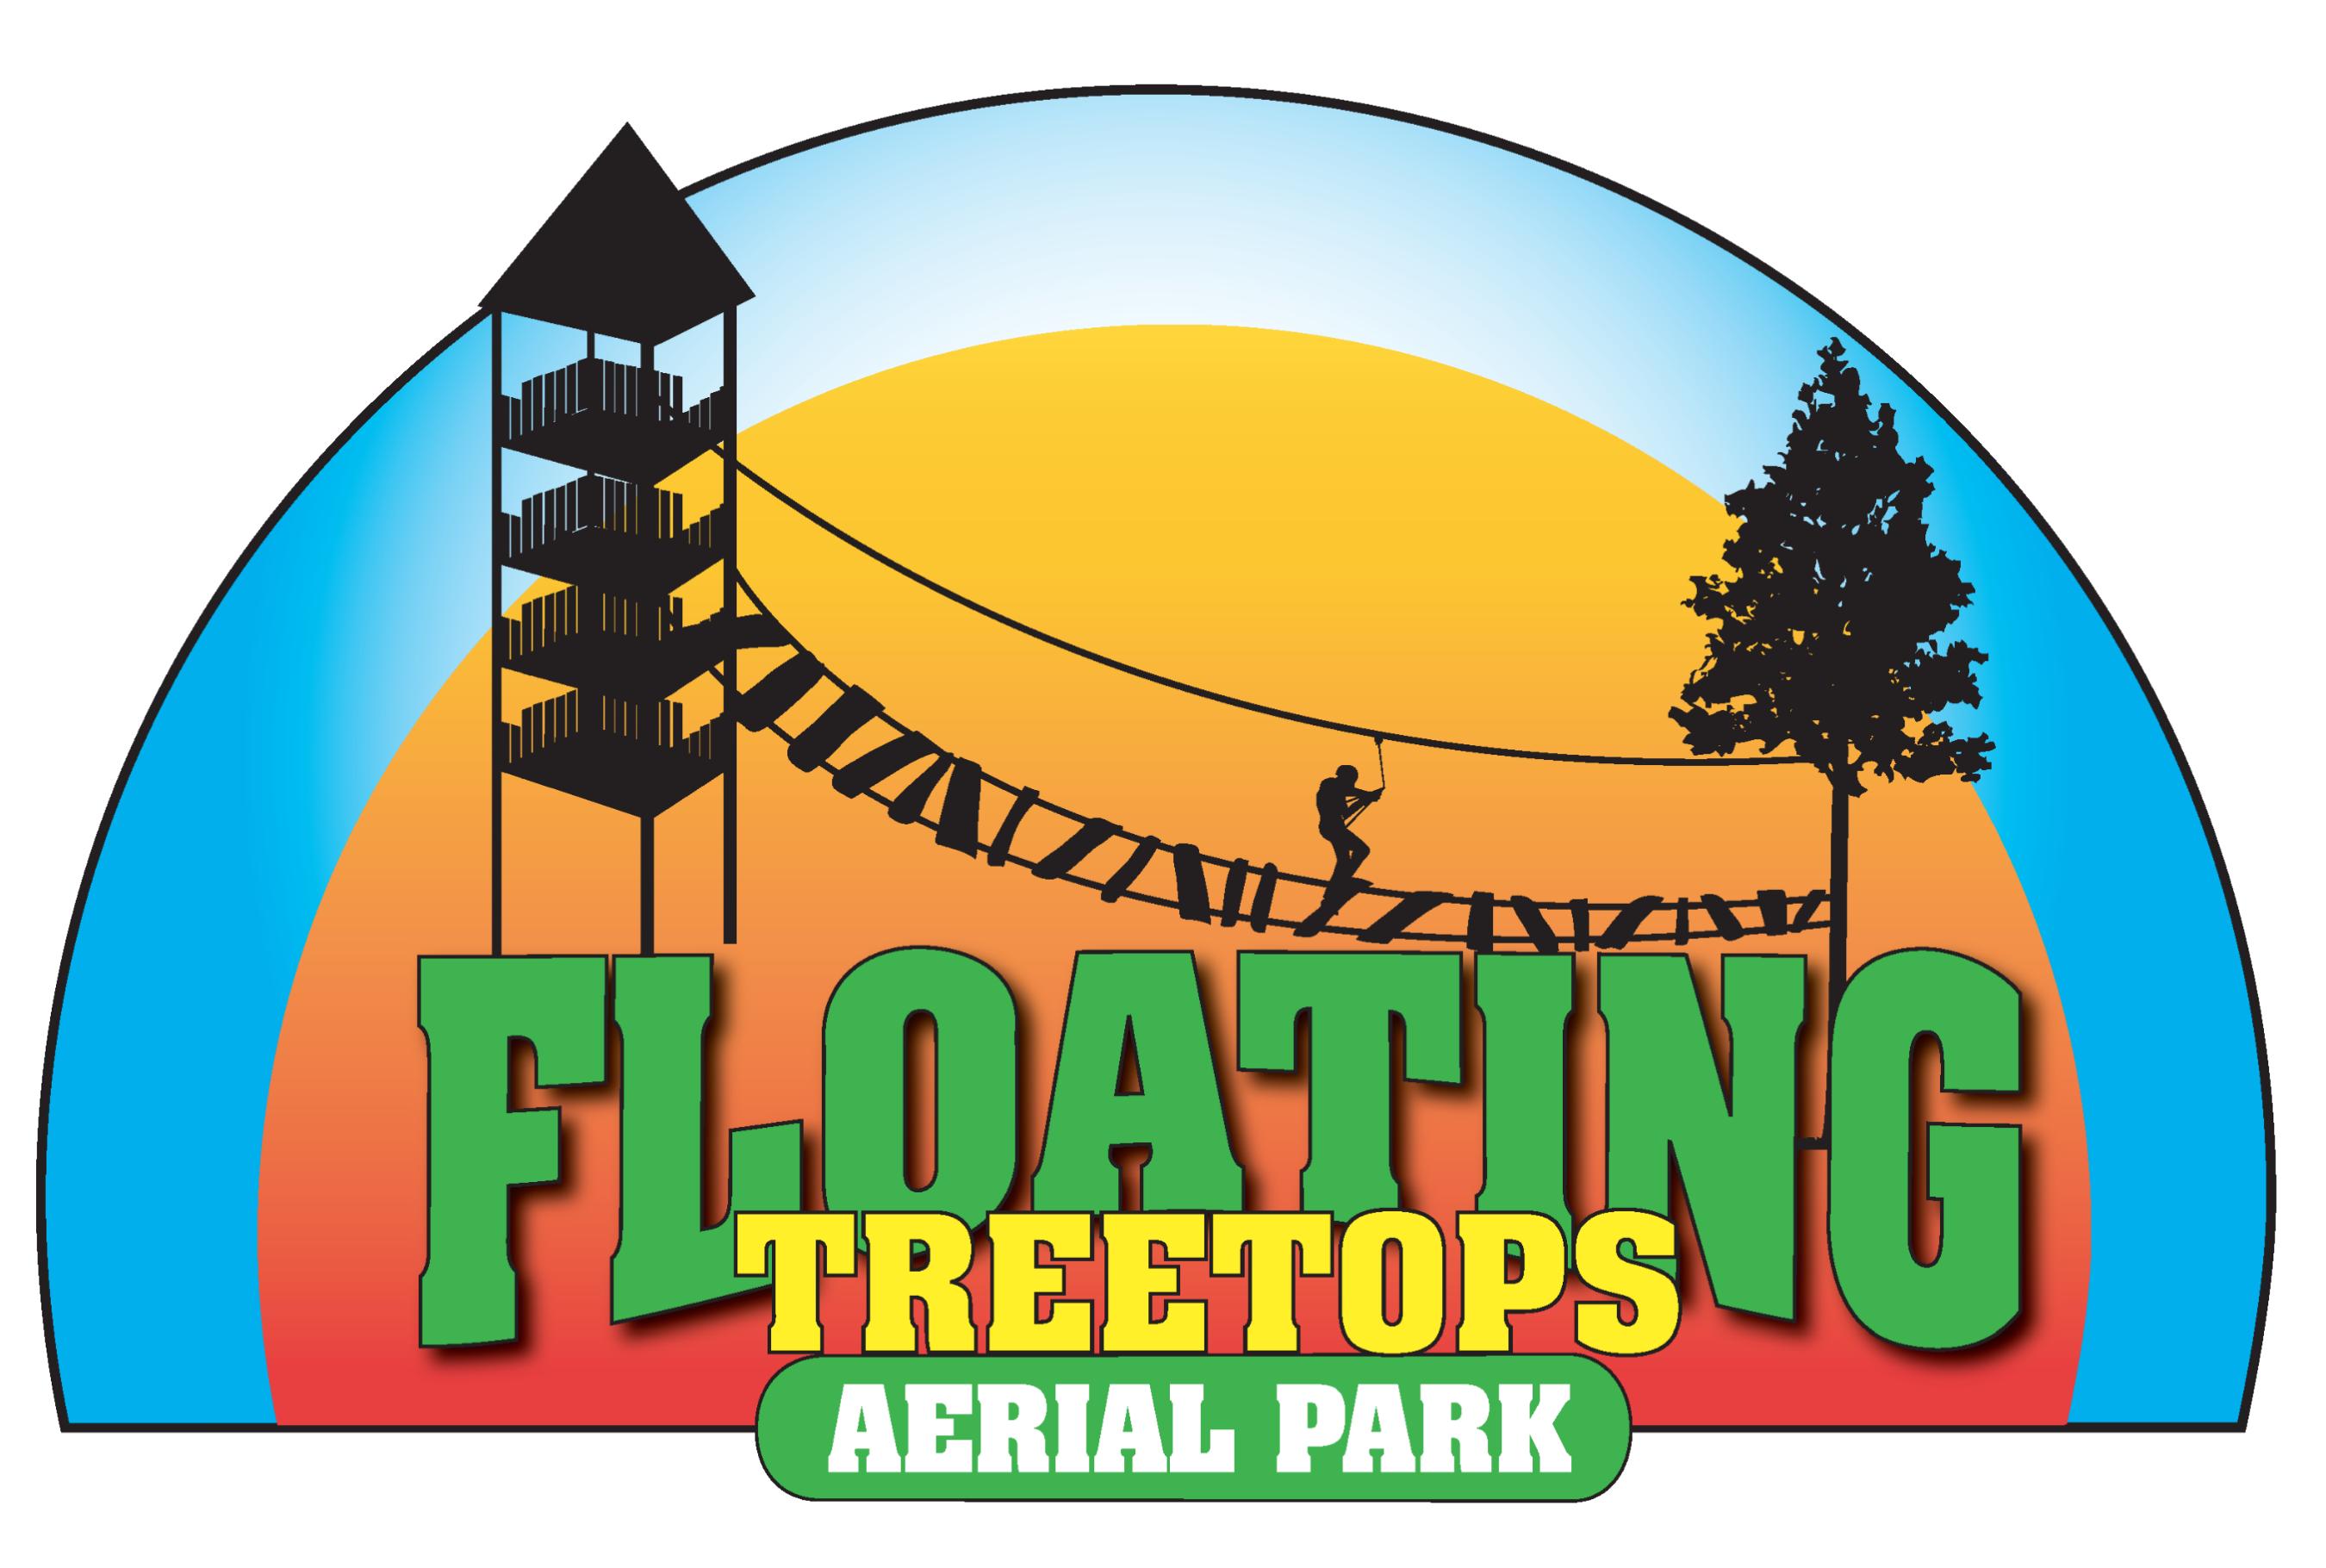 Ozark outdoors riverfront resort. Parking lot clipart car aerial